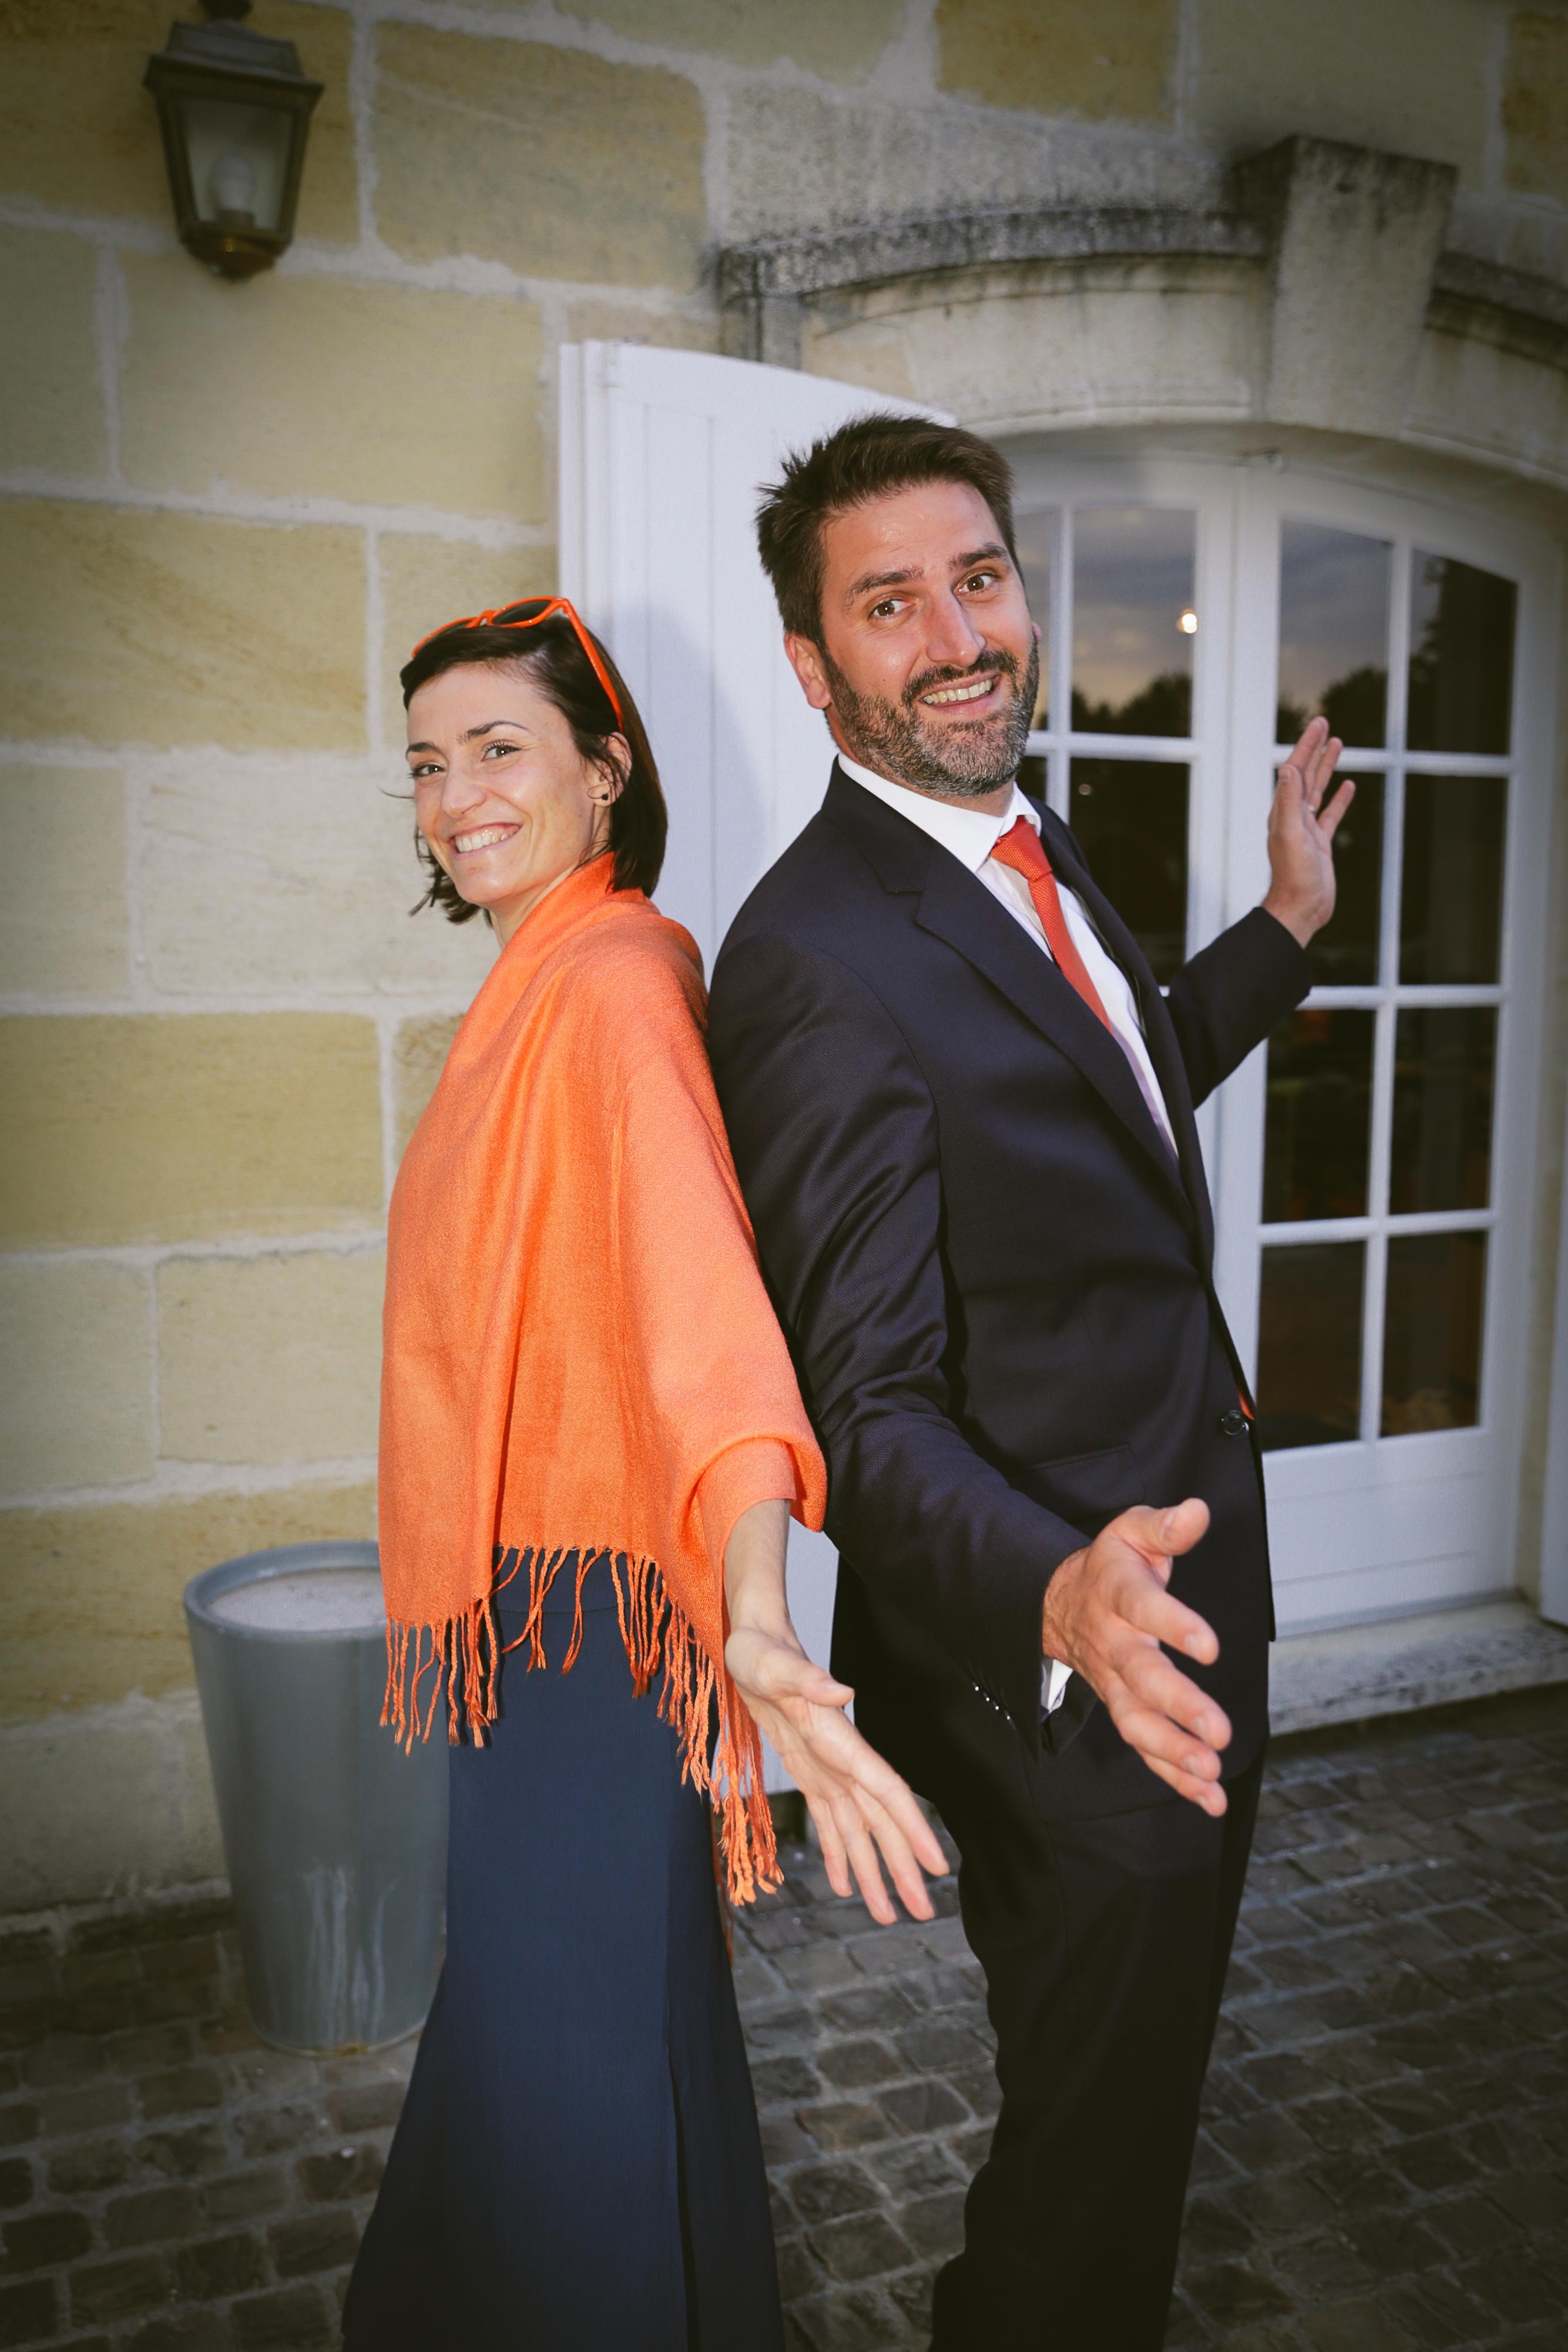 AFTER WORK EN MÉDOC_2020-_Photographe d\'evenements corporate_christophe_boury_www.photographe-33.fr_IMG_0219